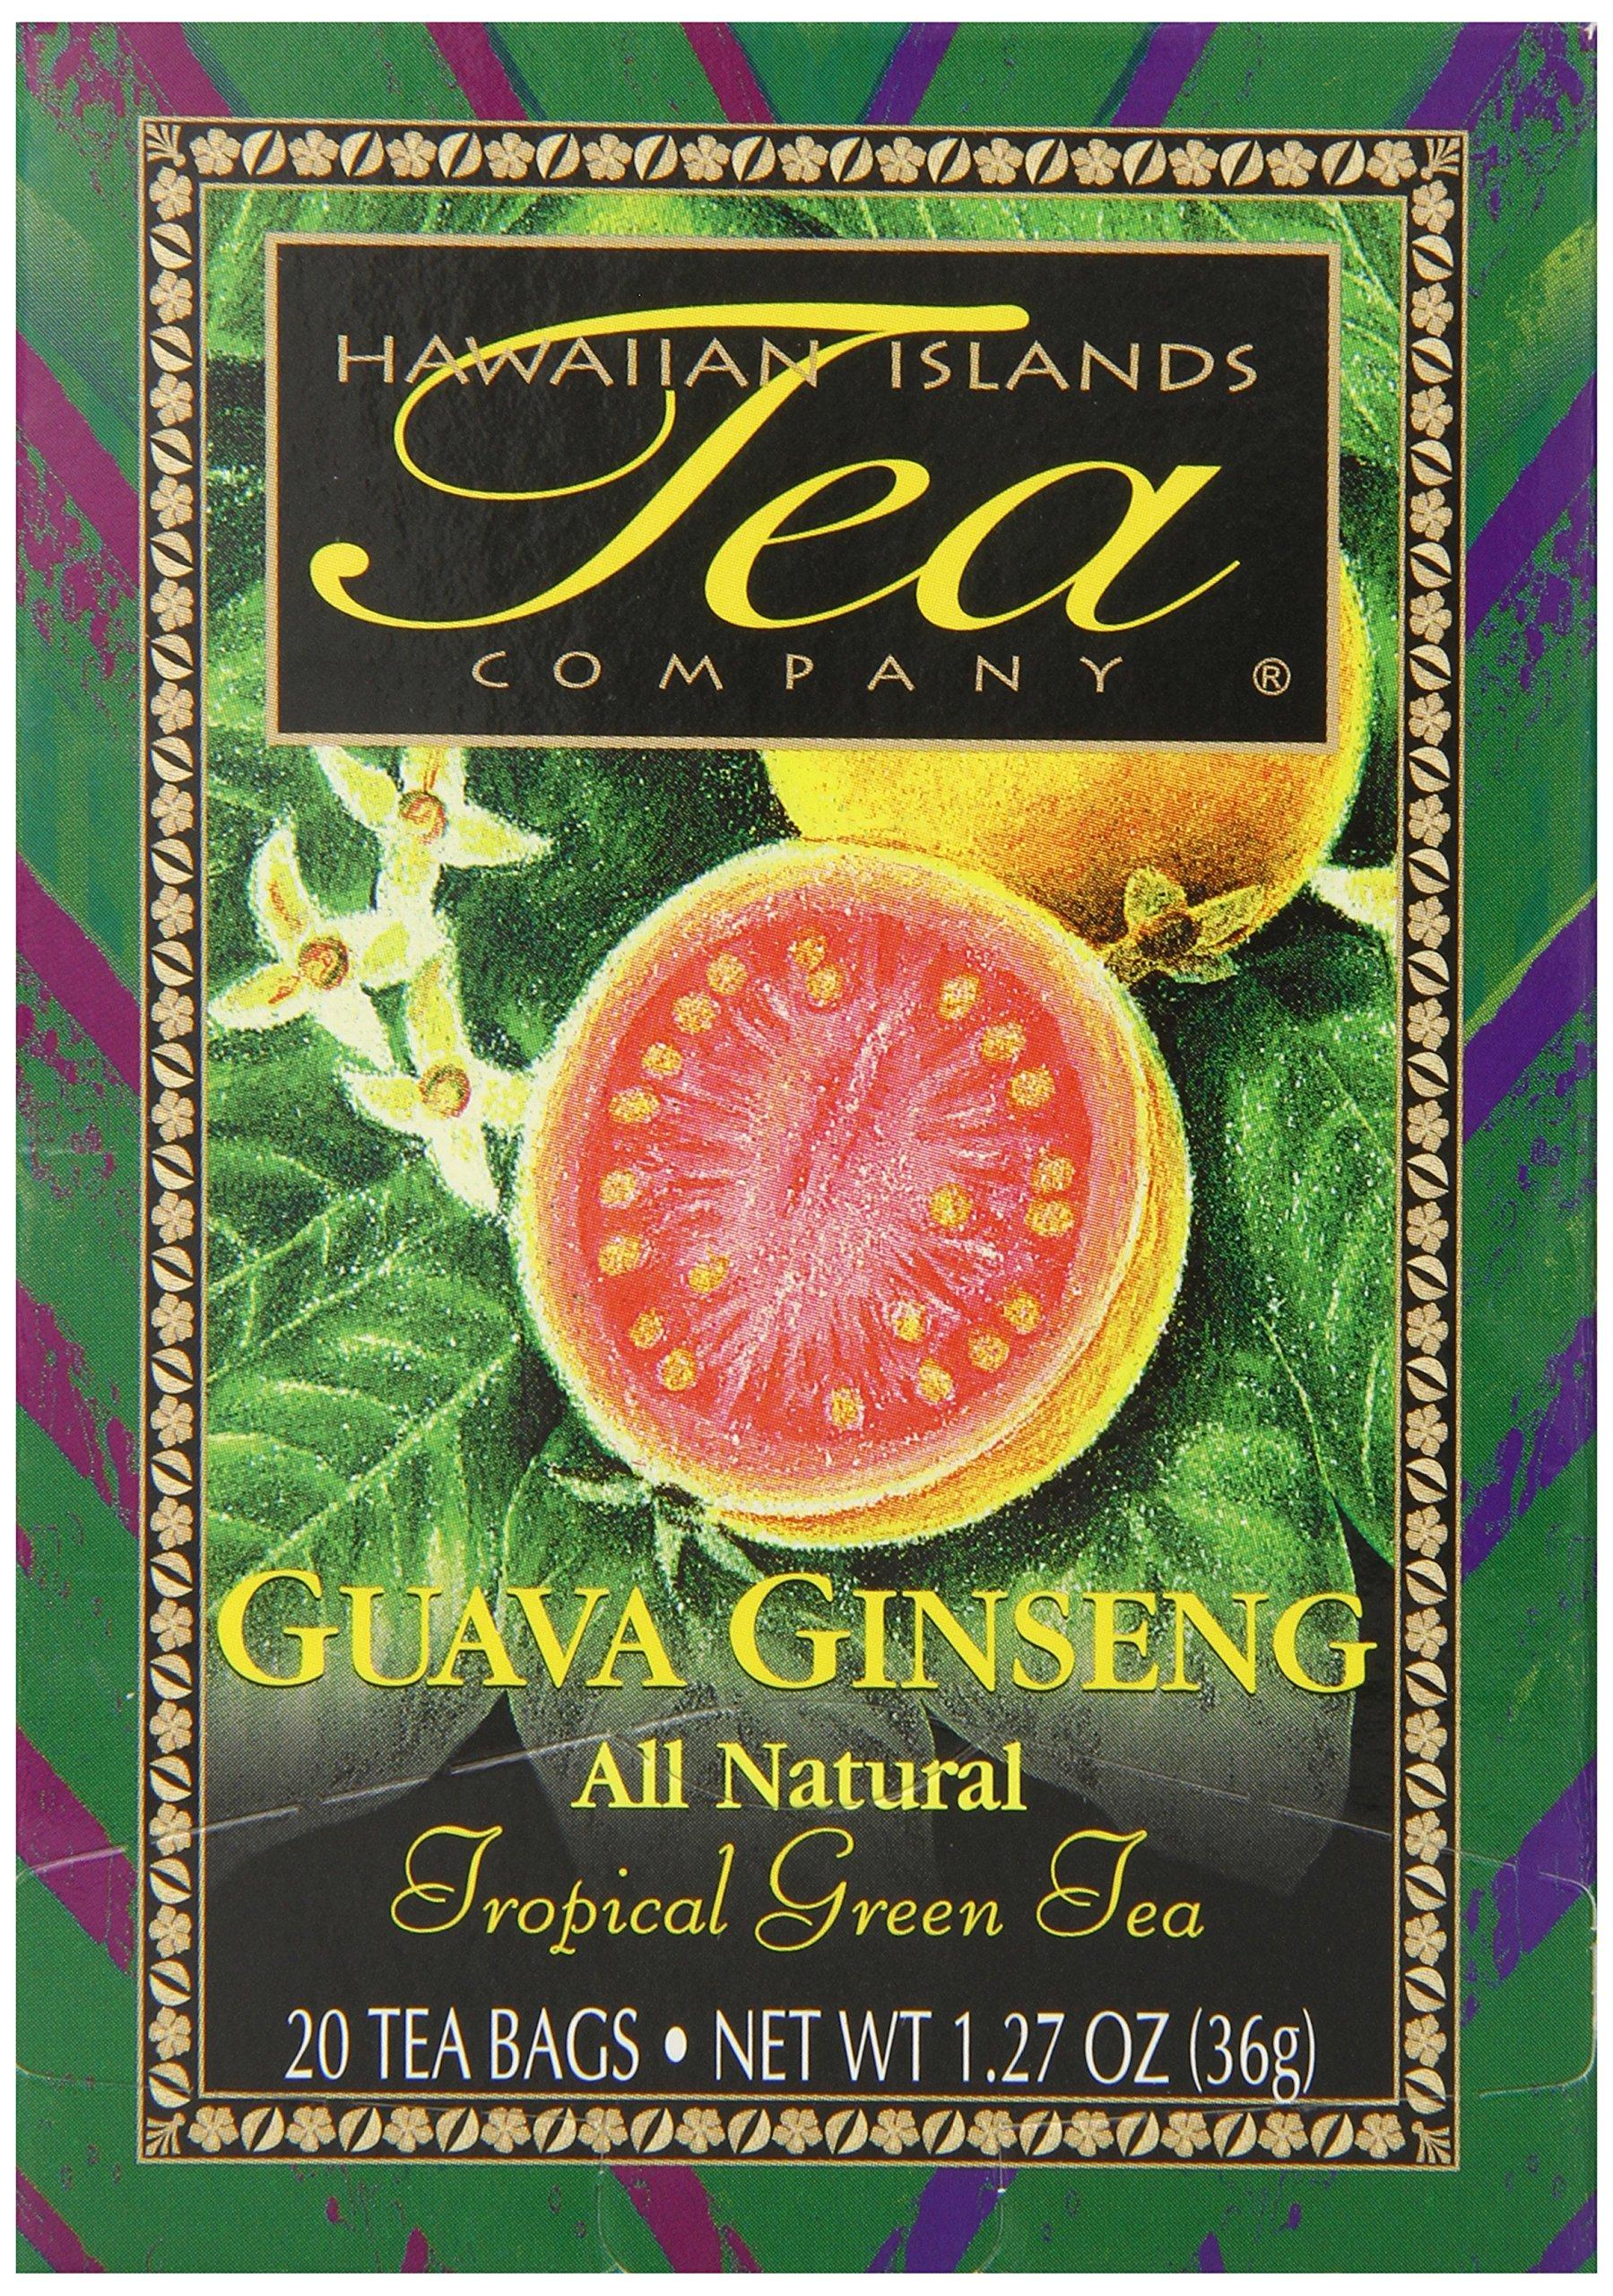 Hawaiian Islands Guava Ginseng Green Tea, 20 Count (Pack of 6)